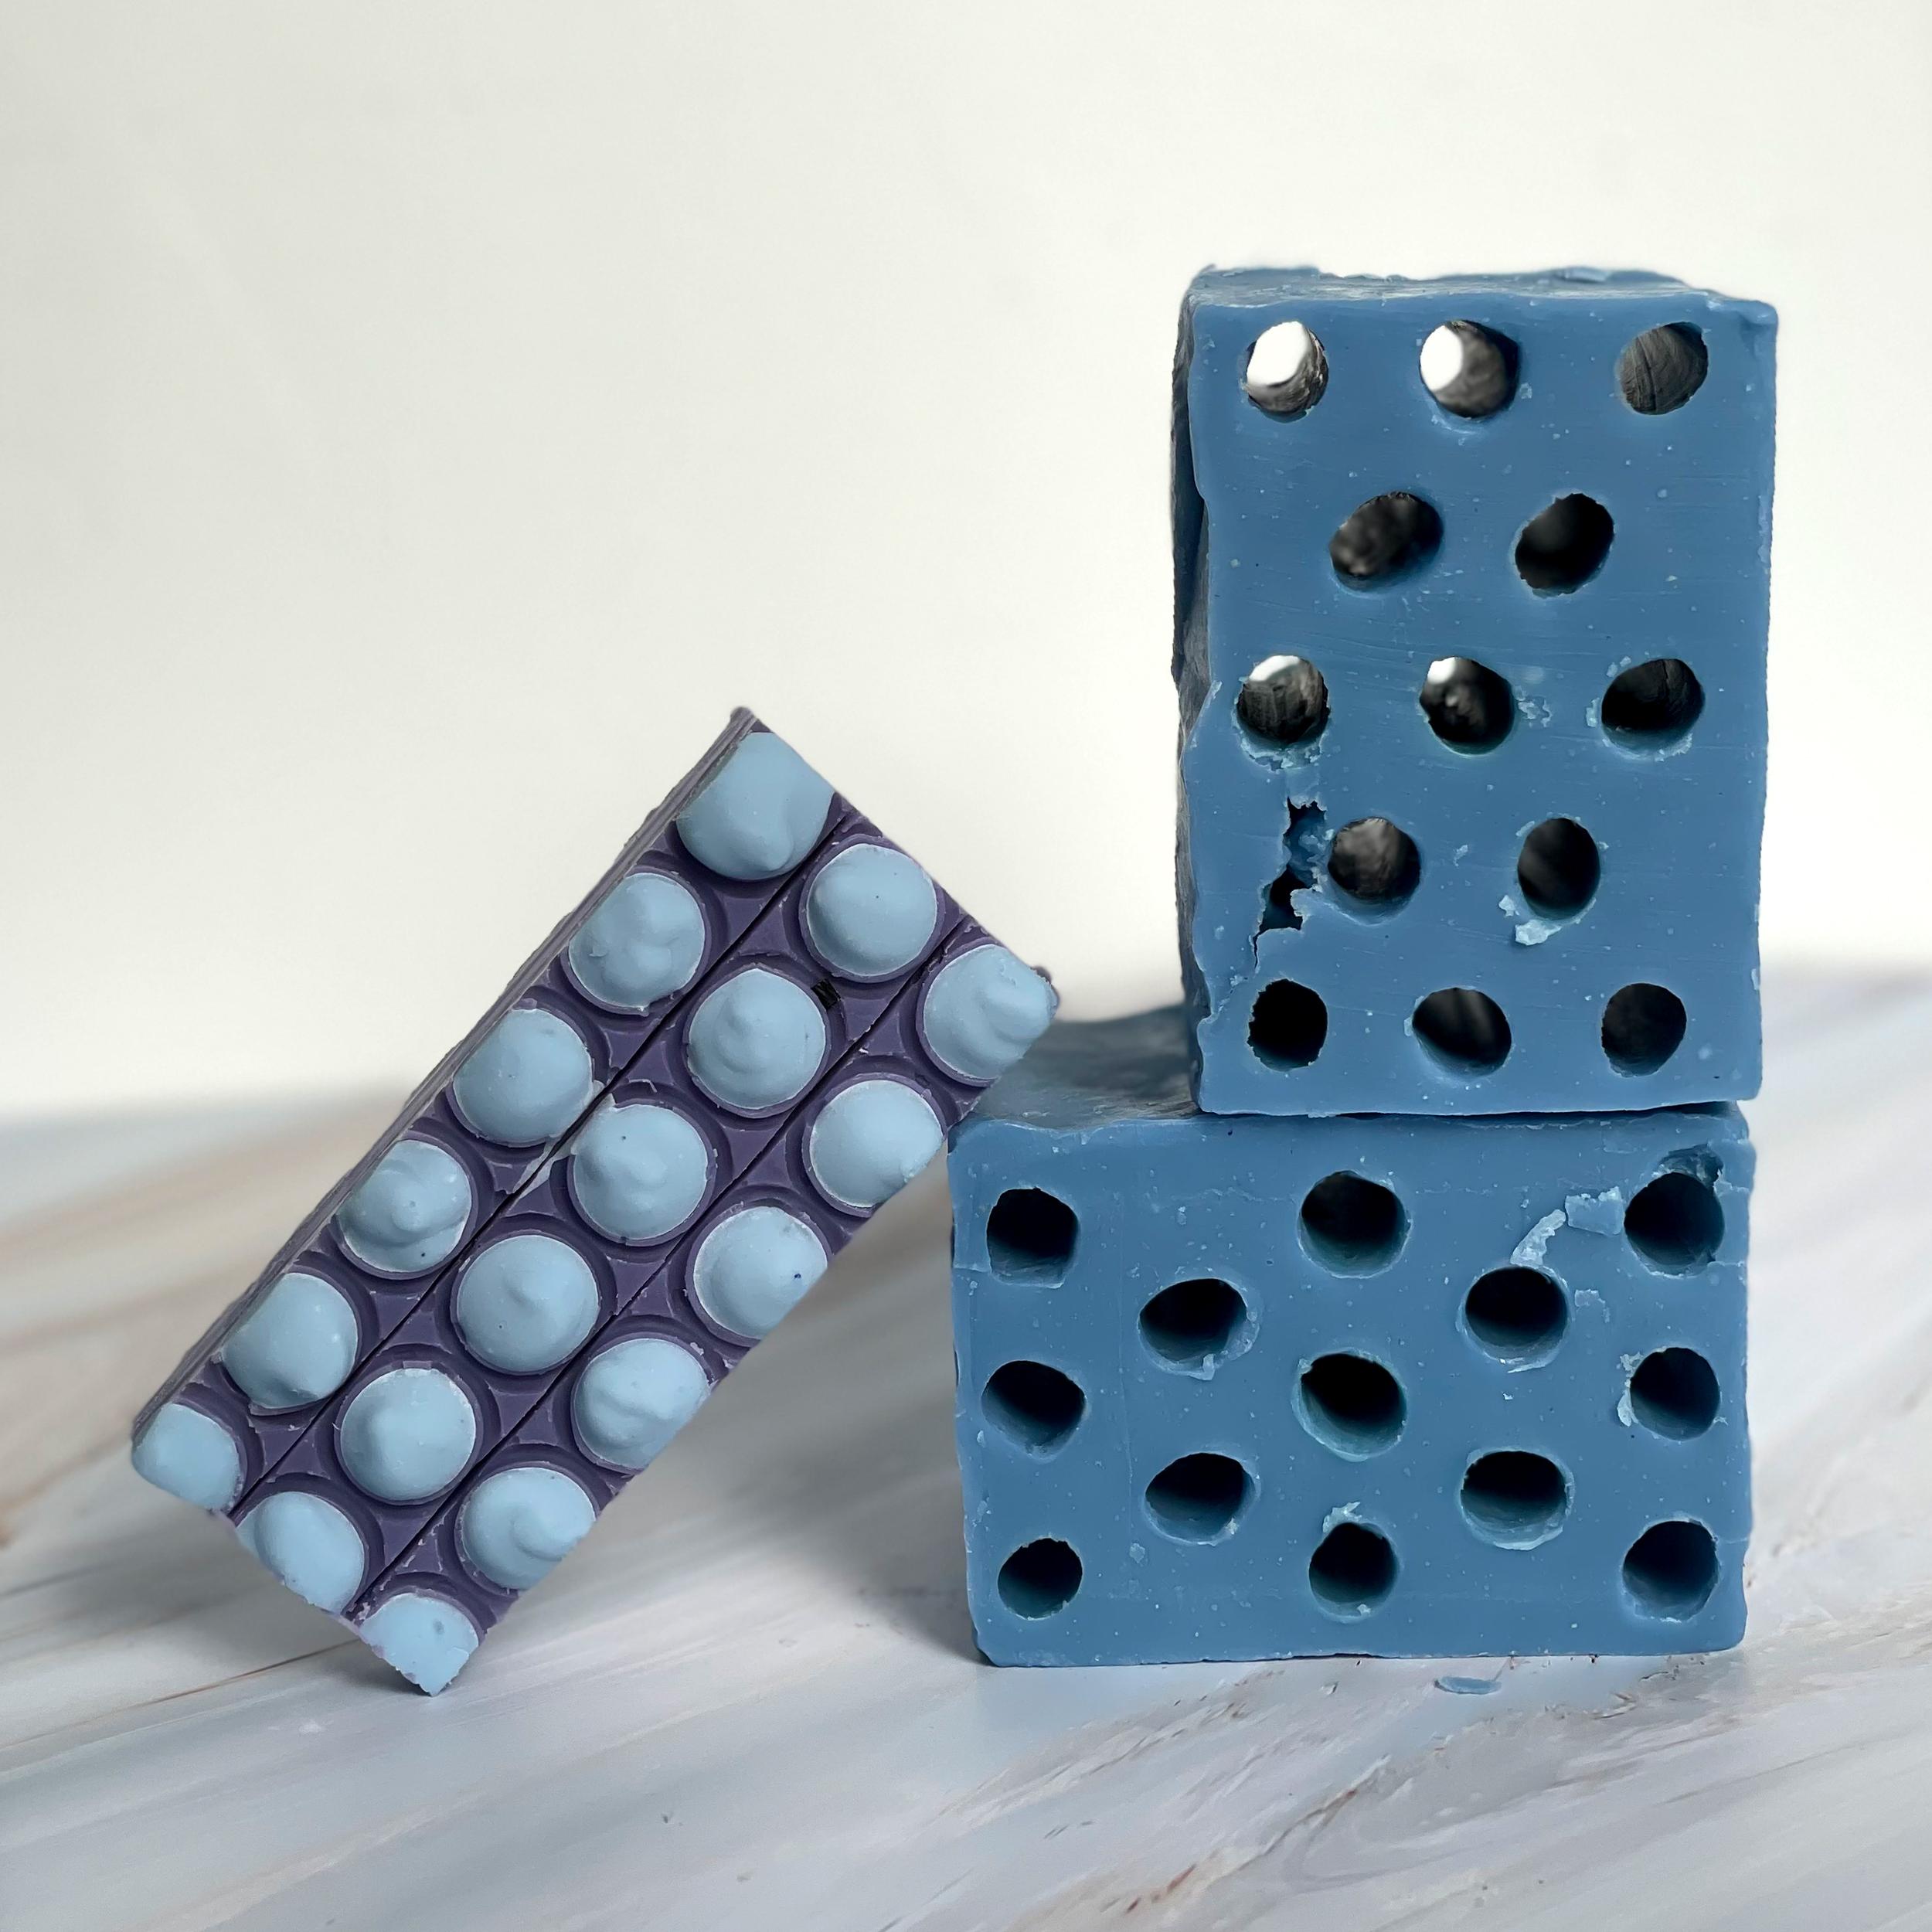 deconstructed constructivist bricks